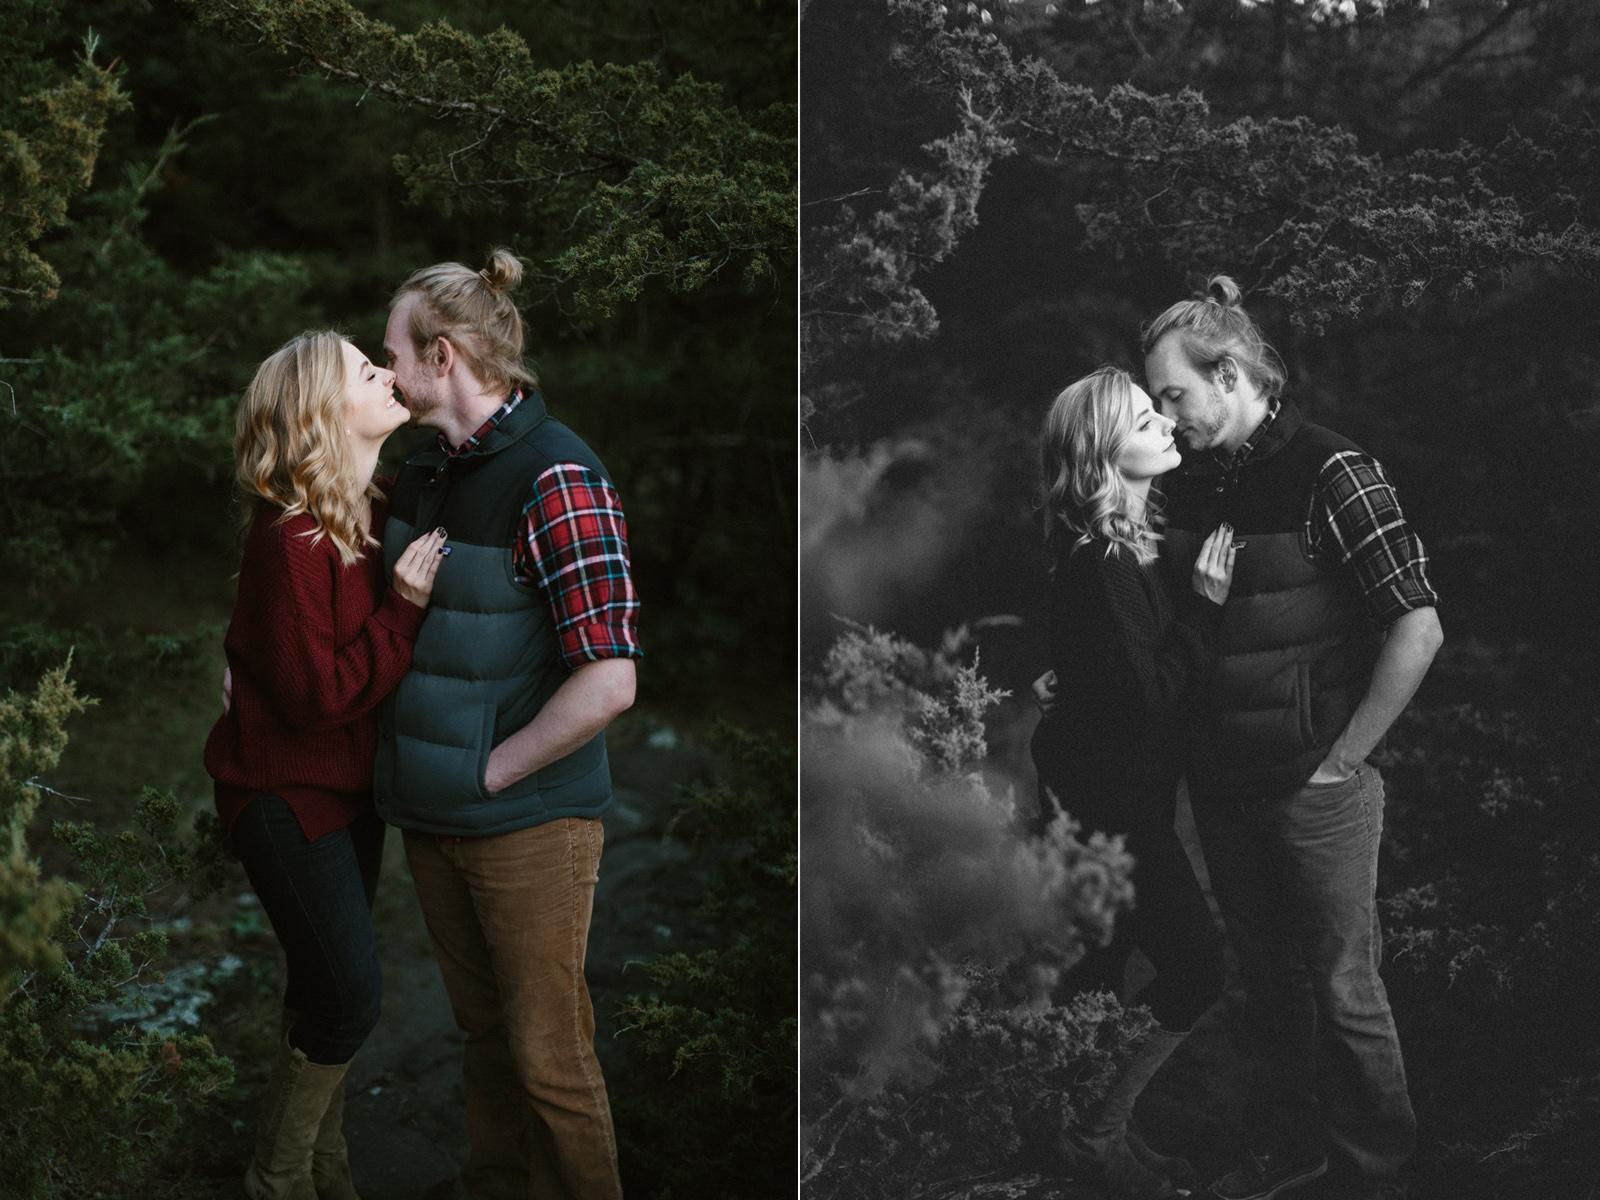 Sioux_Falls_Des_Moines_Engagement_Wedding_Photographer_47.jpg